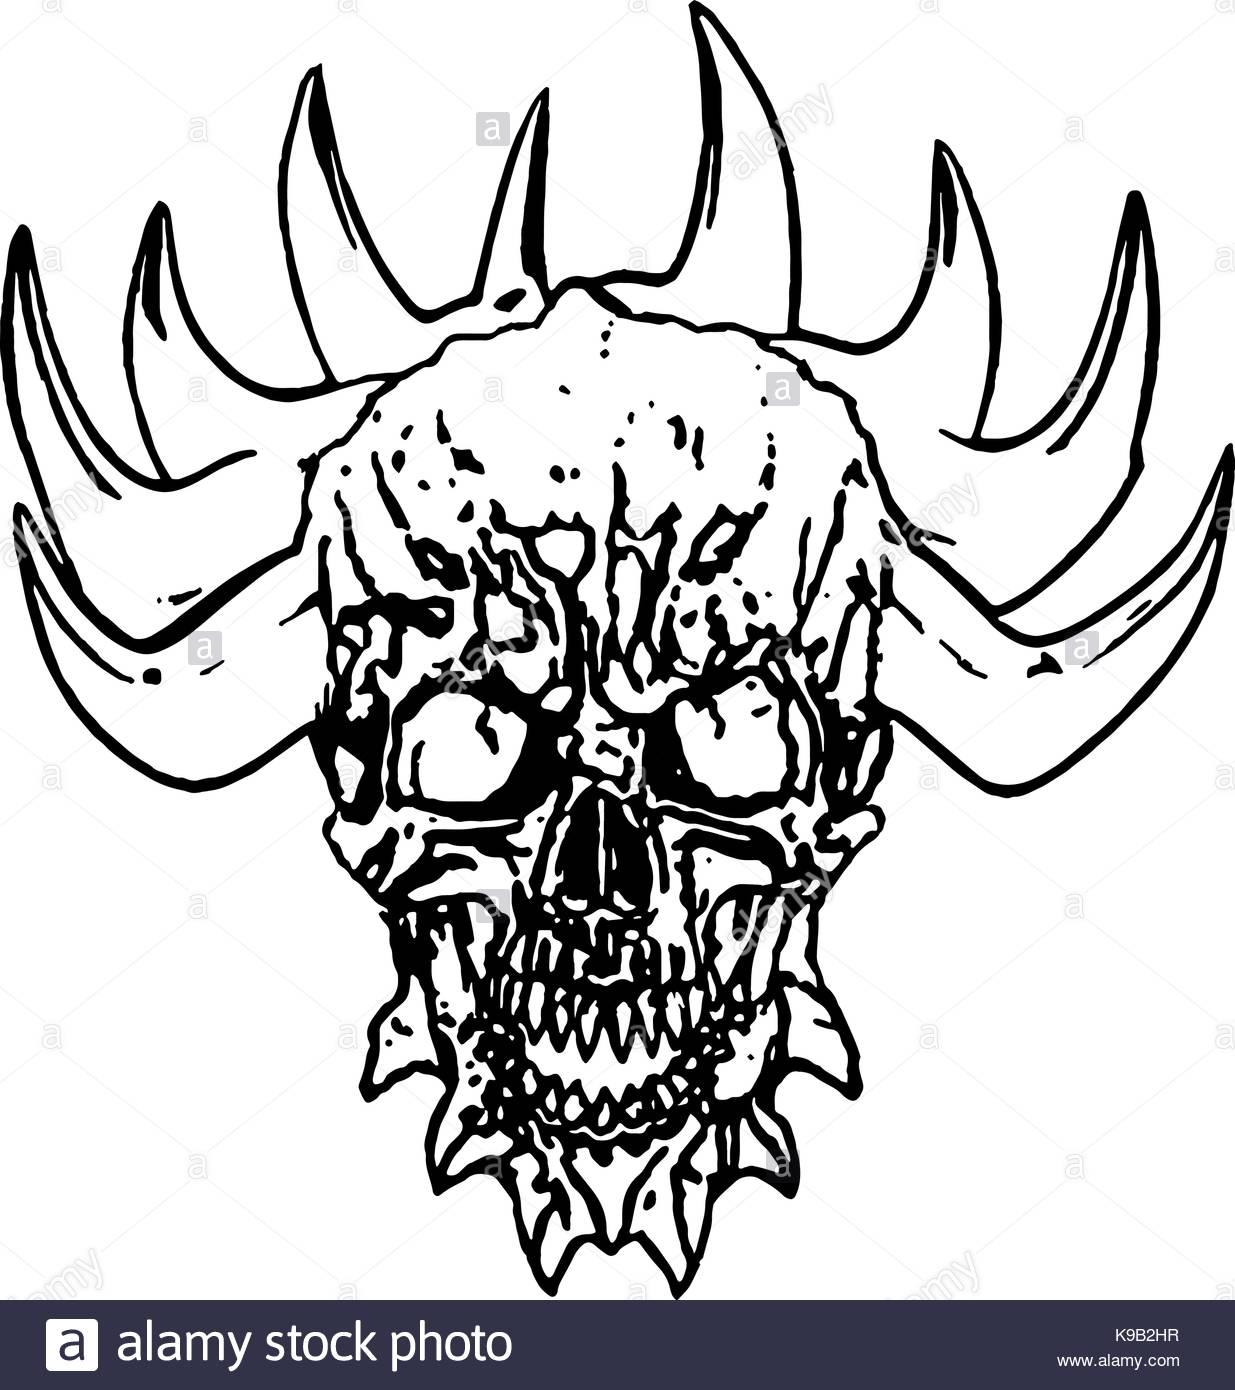 1235x1390 Skull And Bones Tattoo Stock Photos Amp Skull And Bones Tattoo Stock